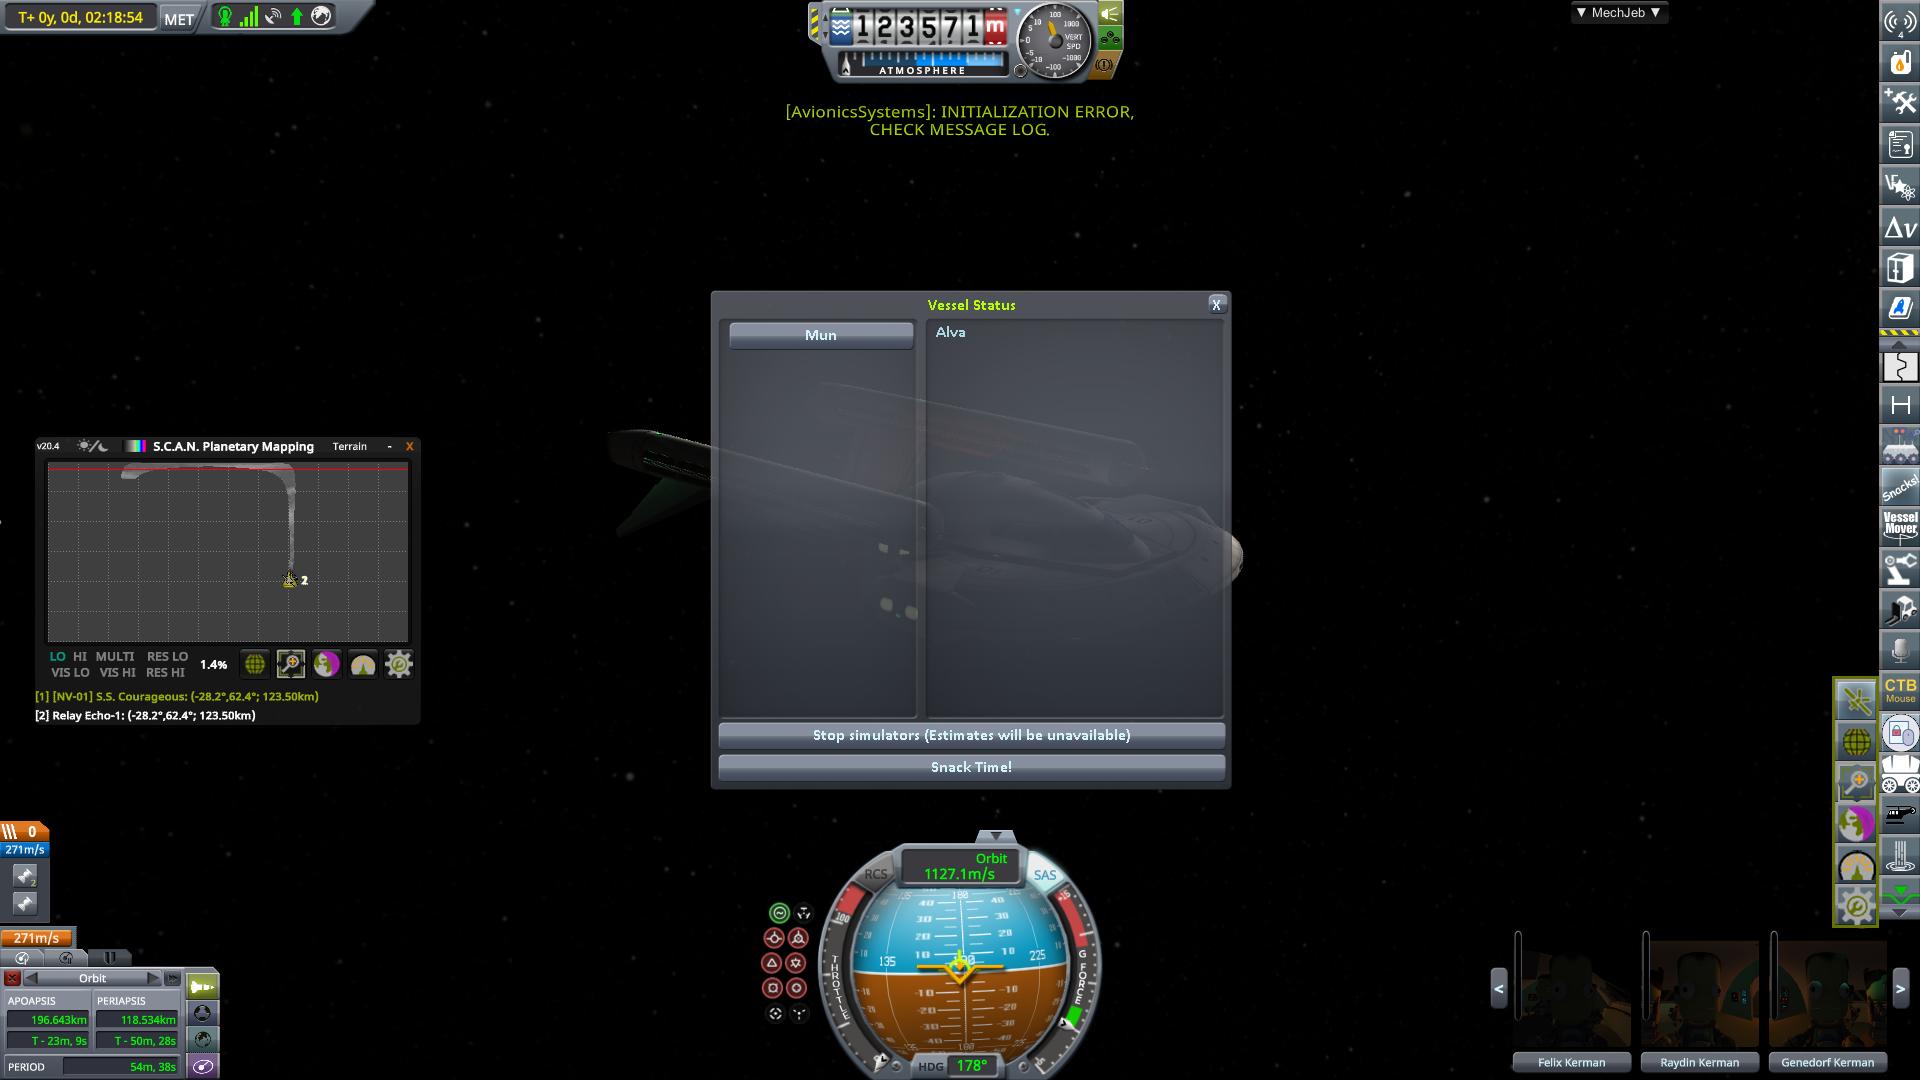 screenshot117.png